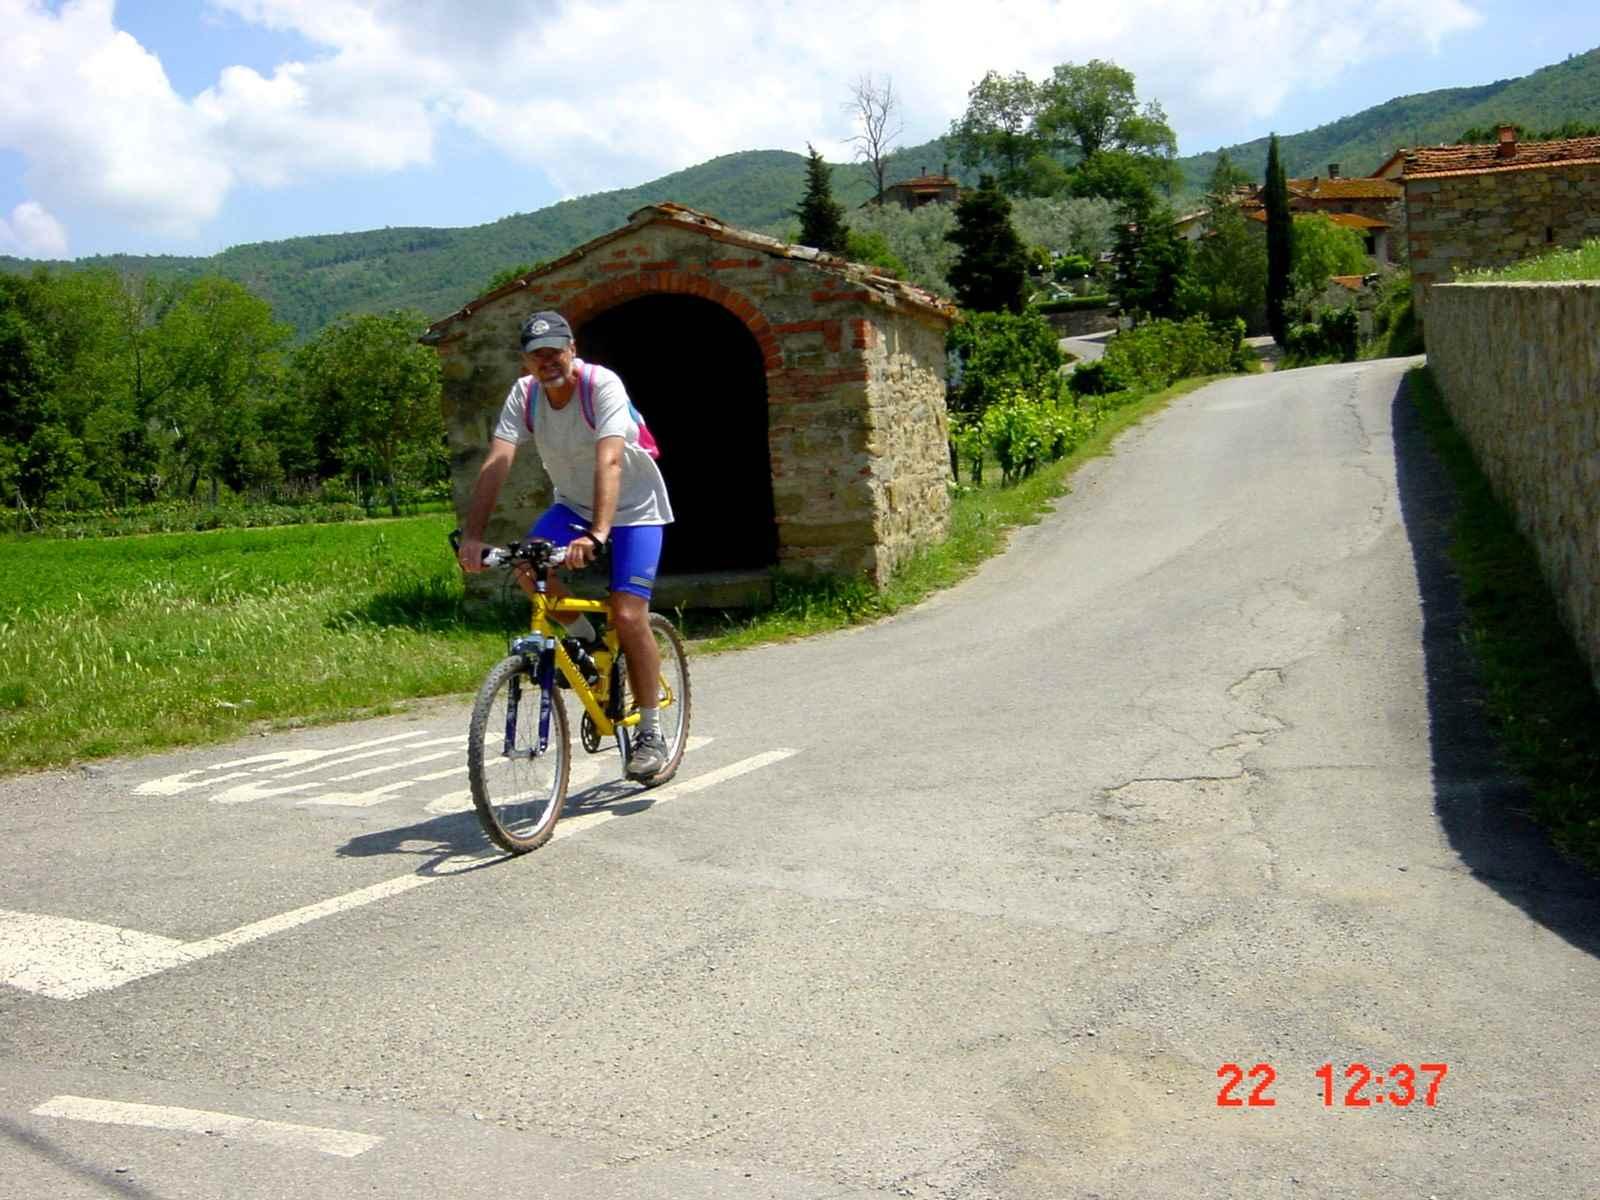 Foto: Manfred Karl / Mountainbike Tour / Monte Castel Giudeo, 1037 m / Kurz vor Castiglion Fiorentino / 20.06.2007 06:24:44